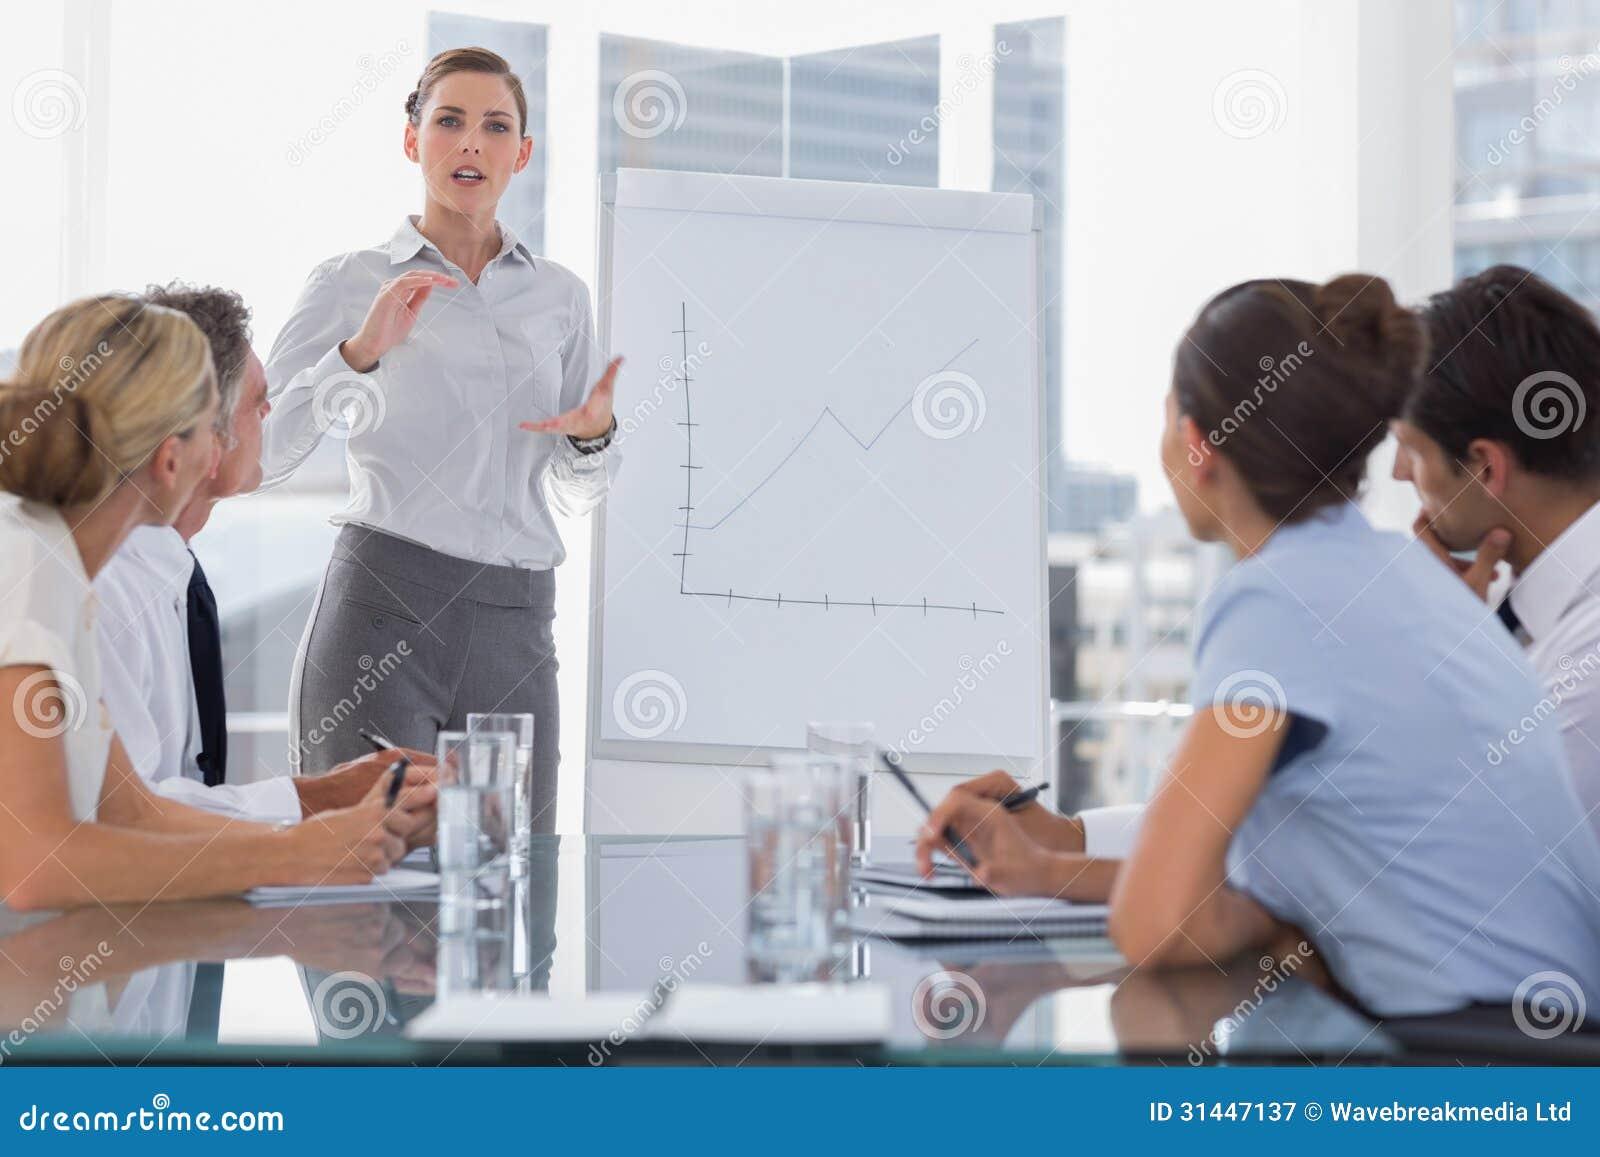 Meeting Room Smart Board